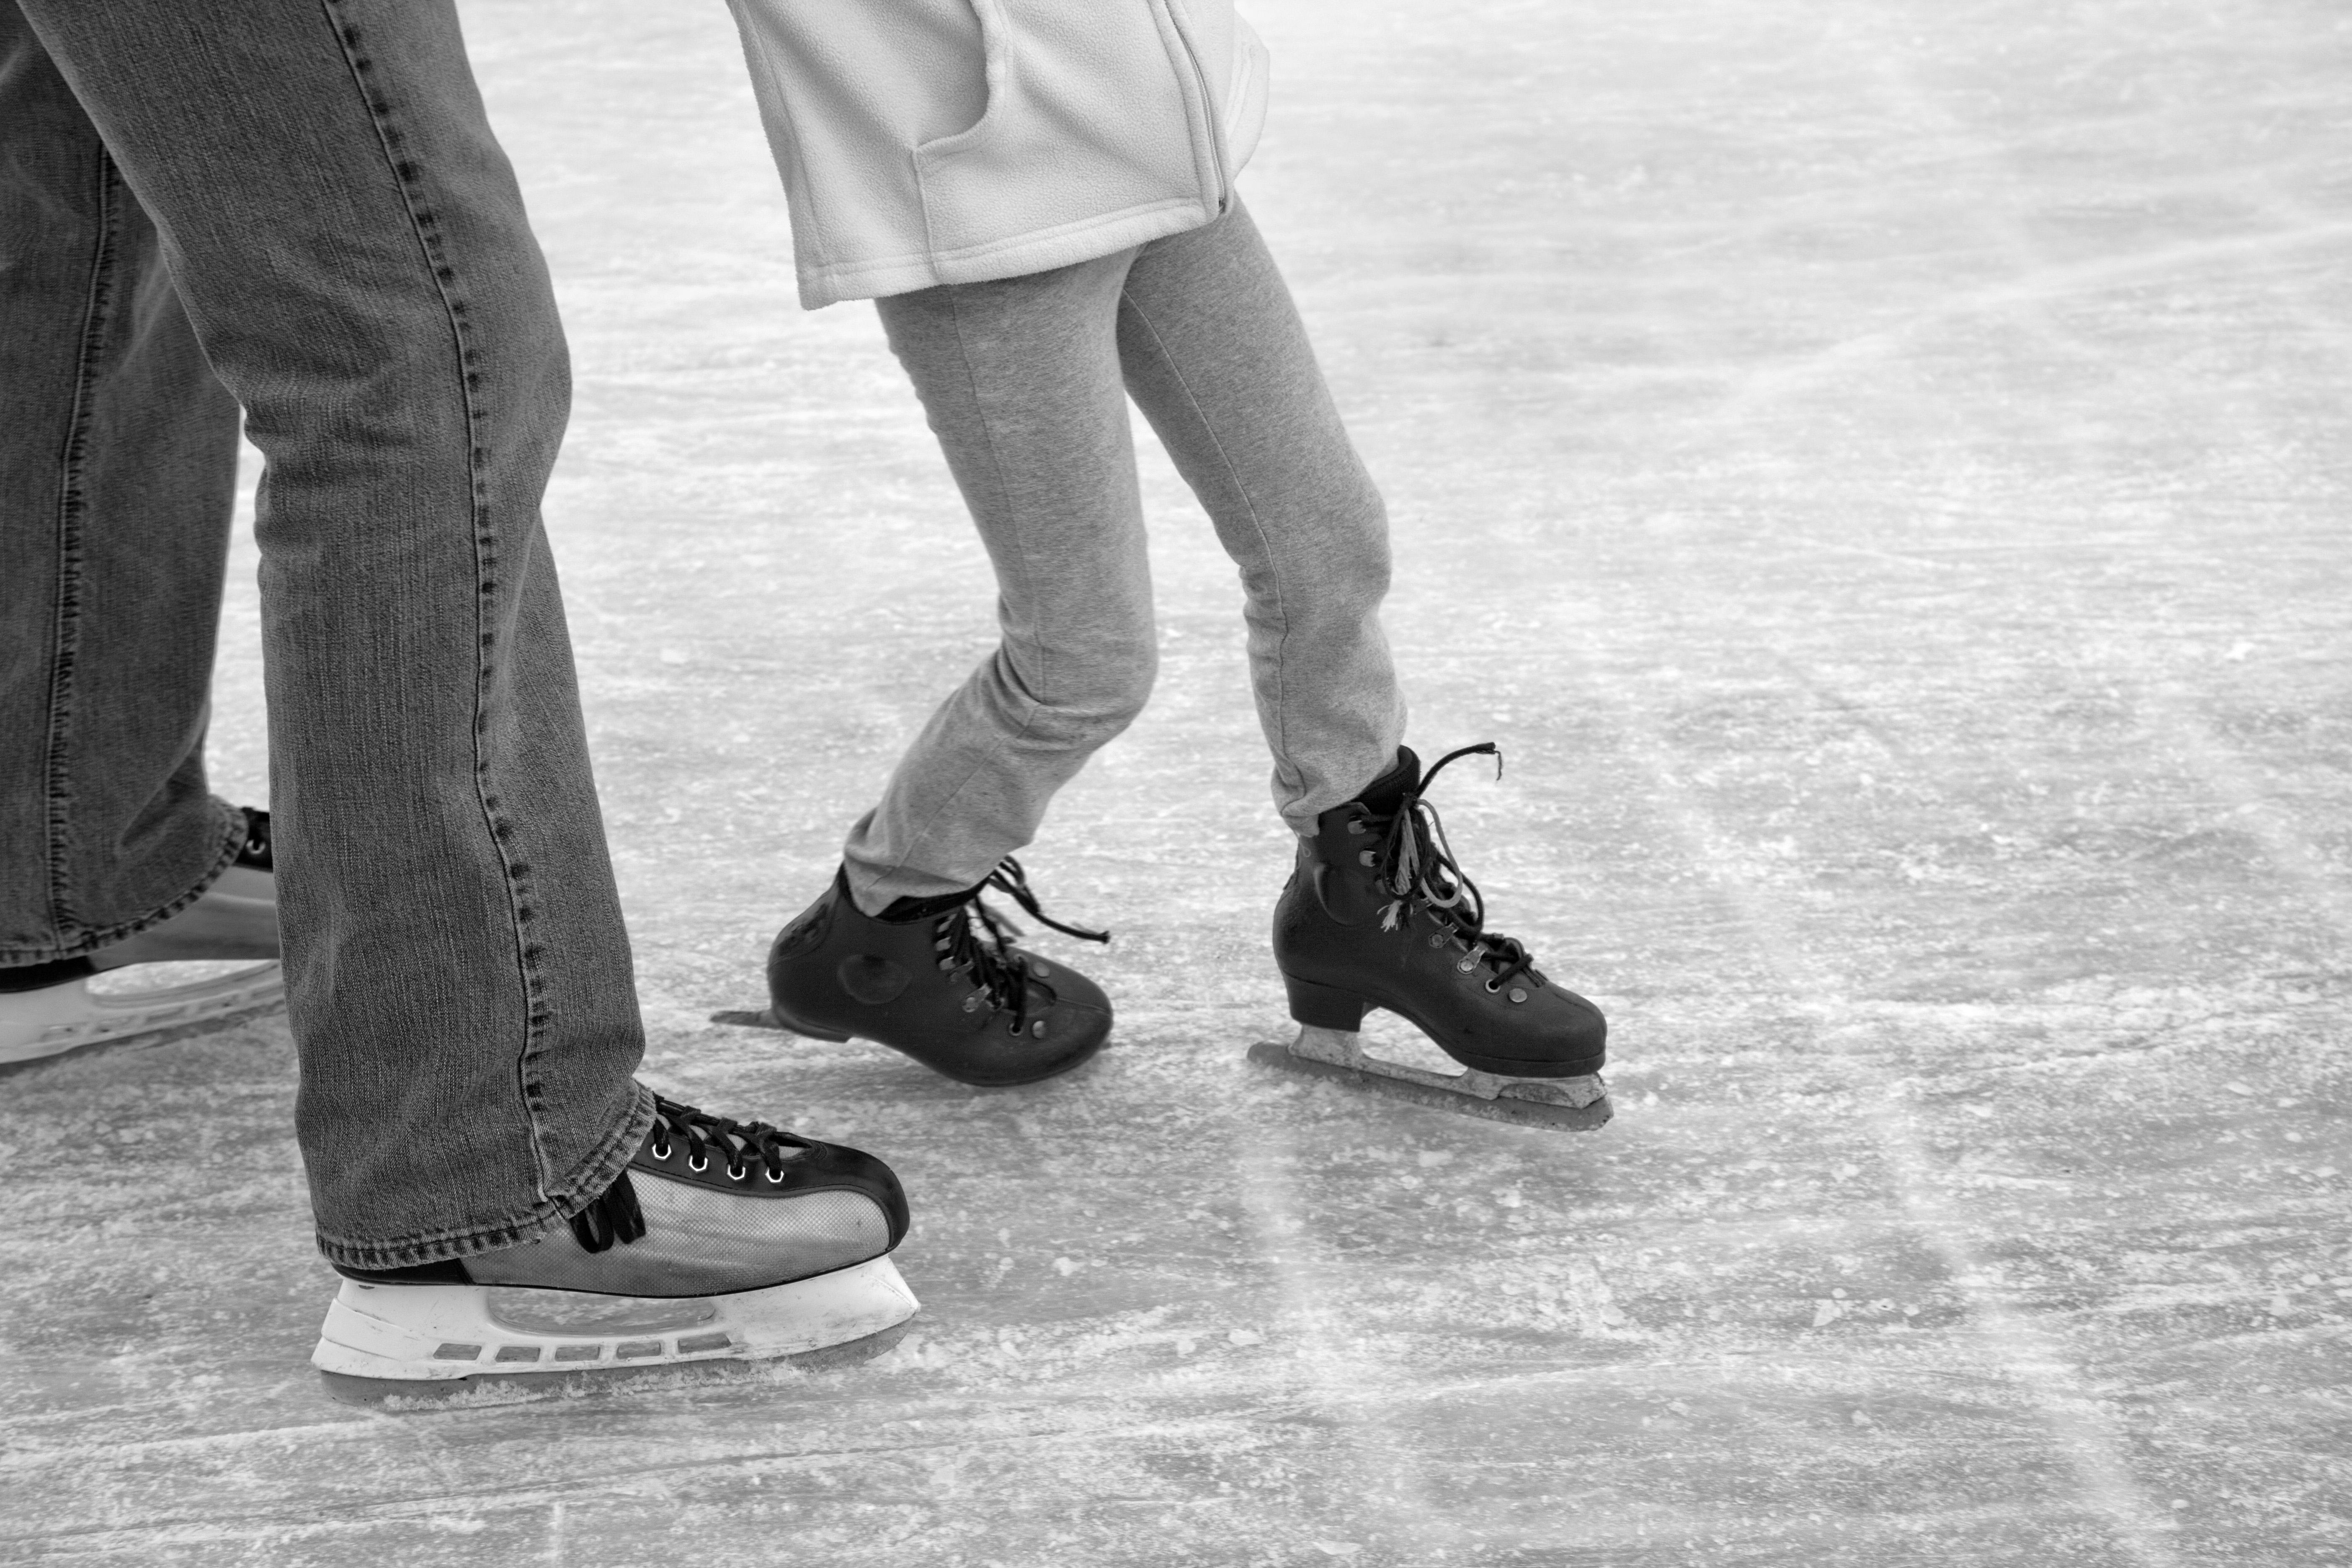 Images gratuites chaussure noir et blanc patin jambe - Patin antiderapant chaussure ...